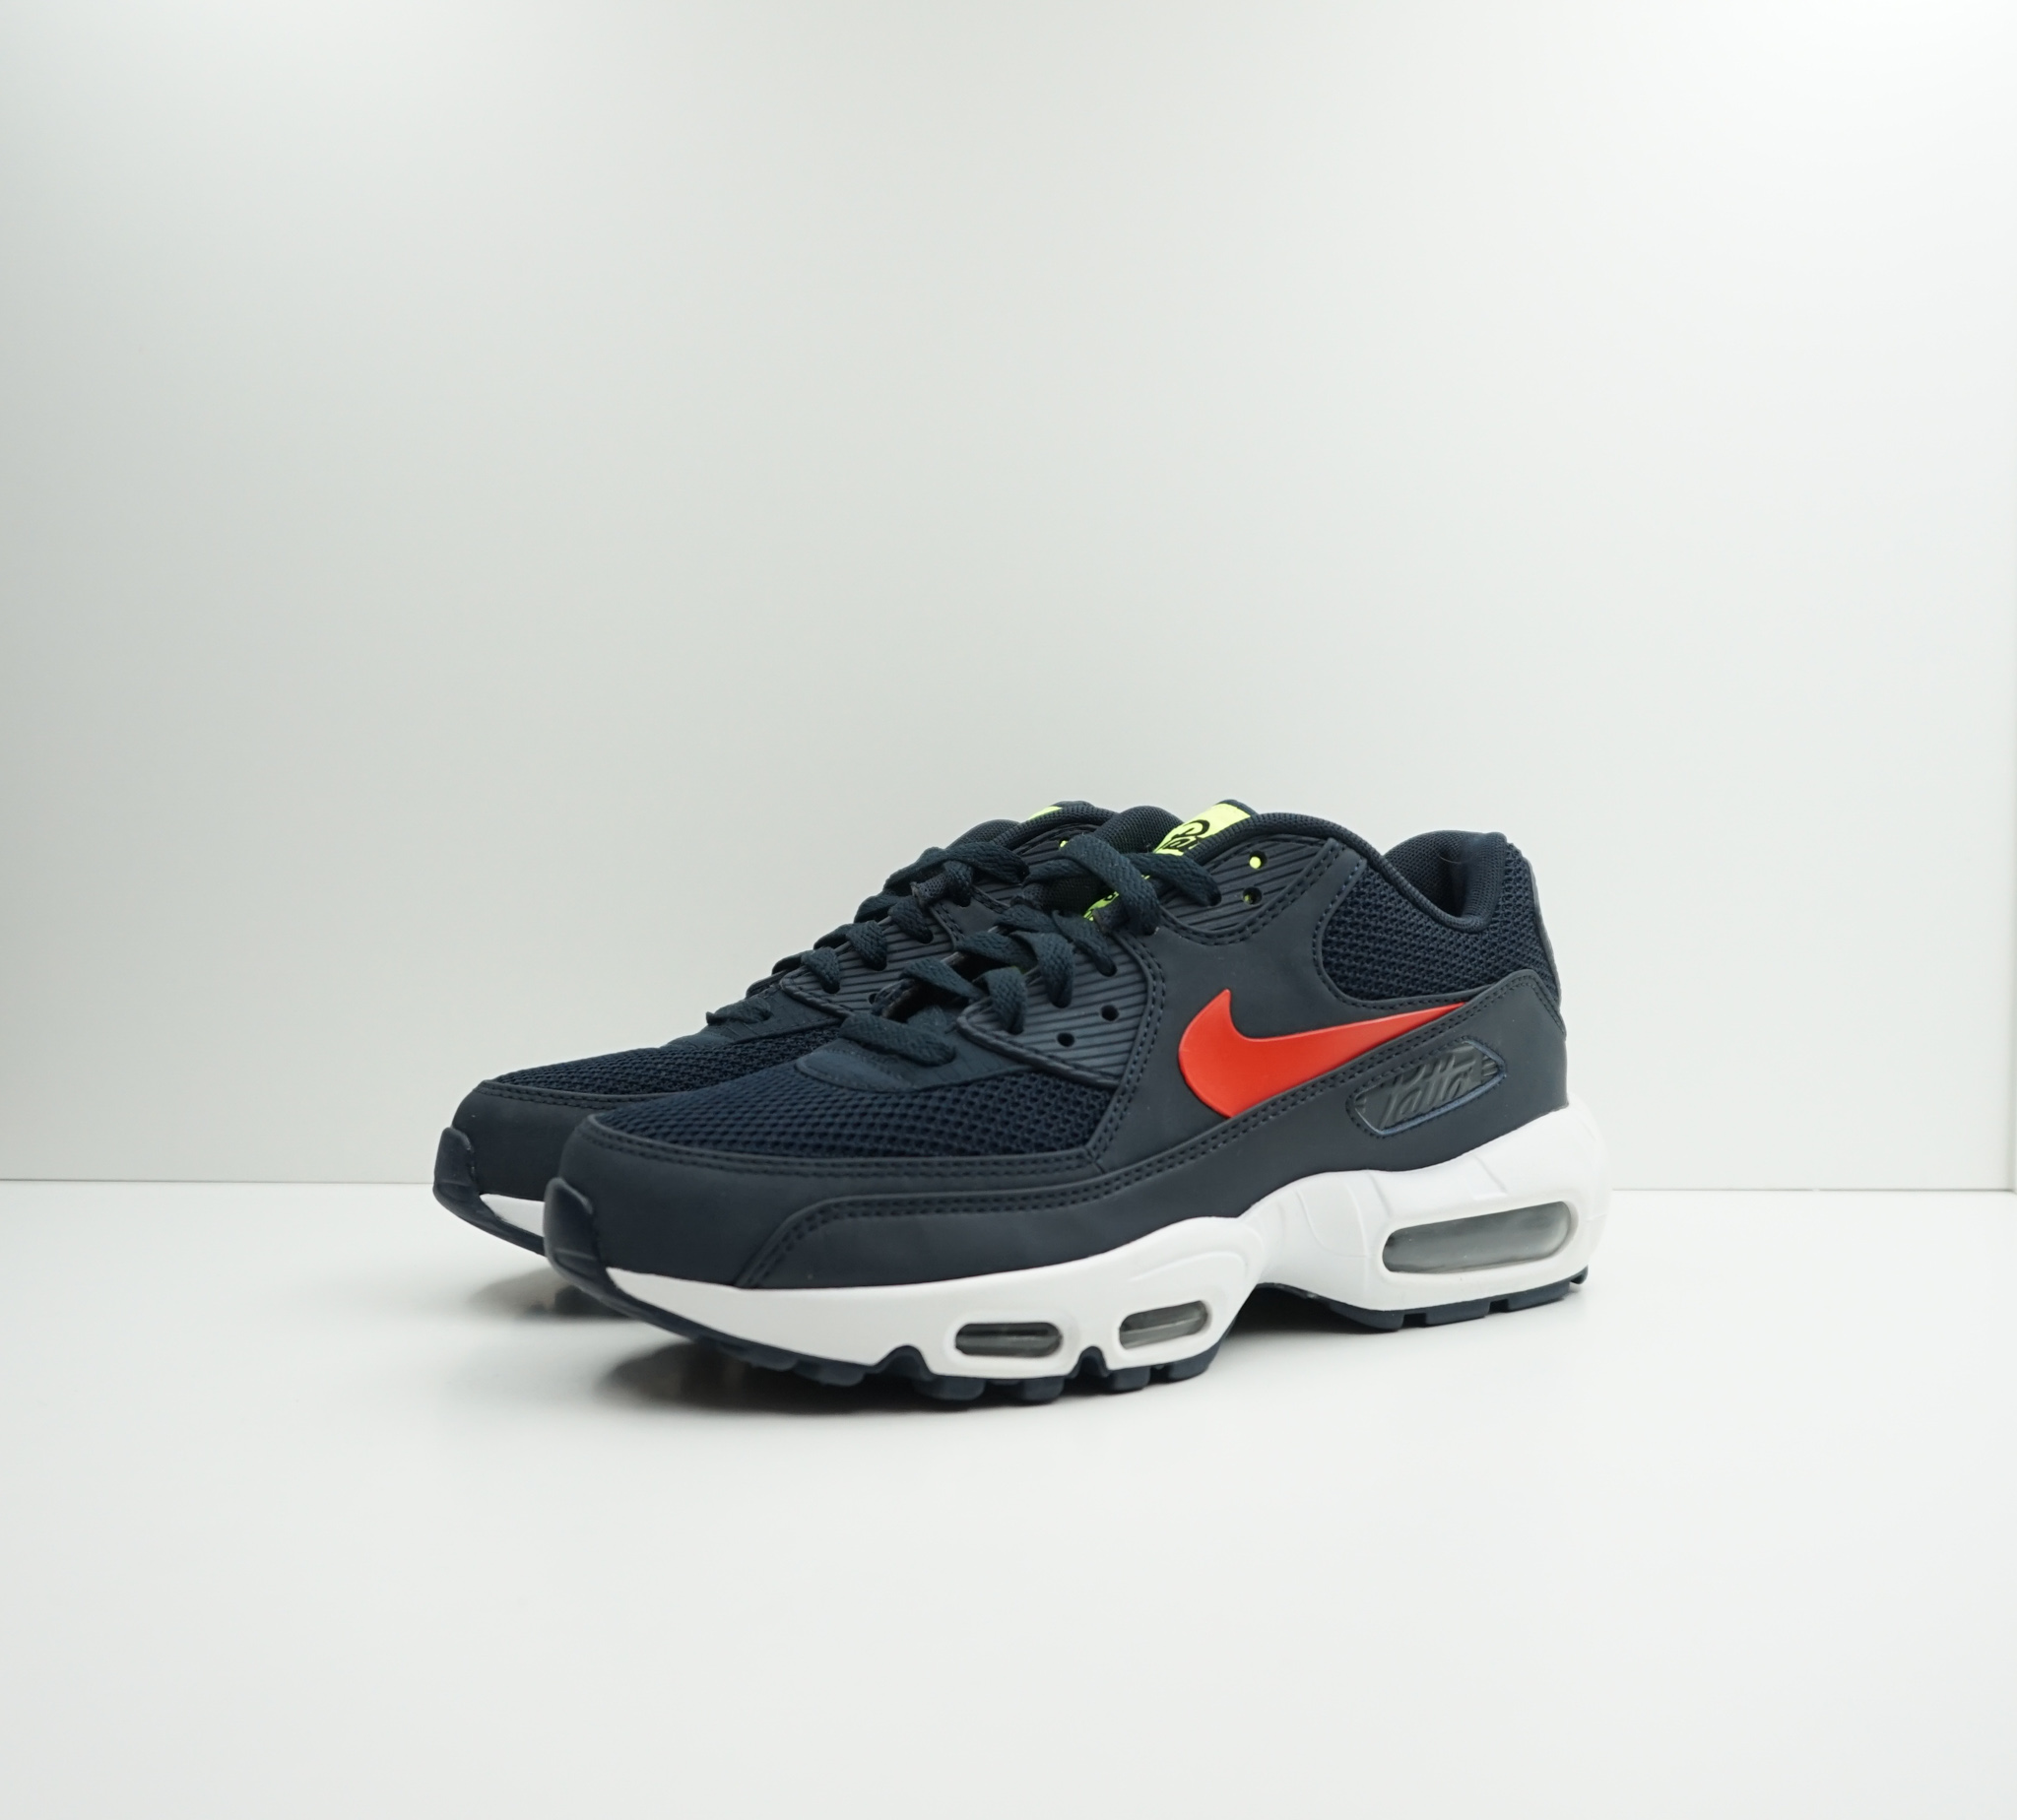 Nike Air Max 95/90 Patta Publicity. Publicity. Wohooooow! (Obsidian)